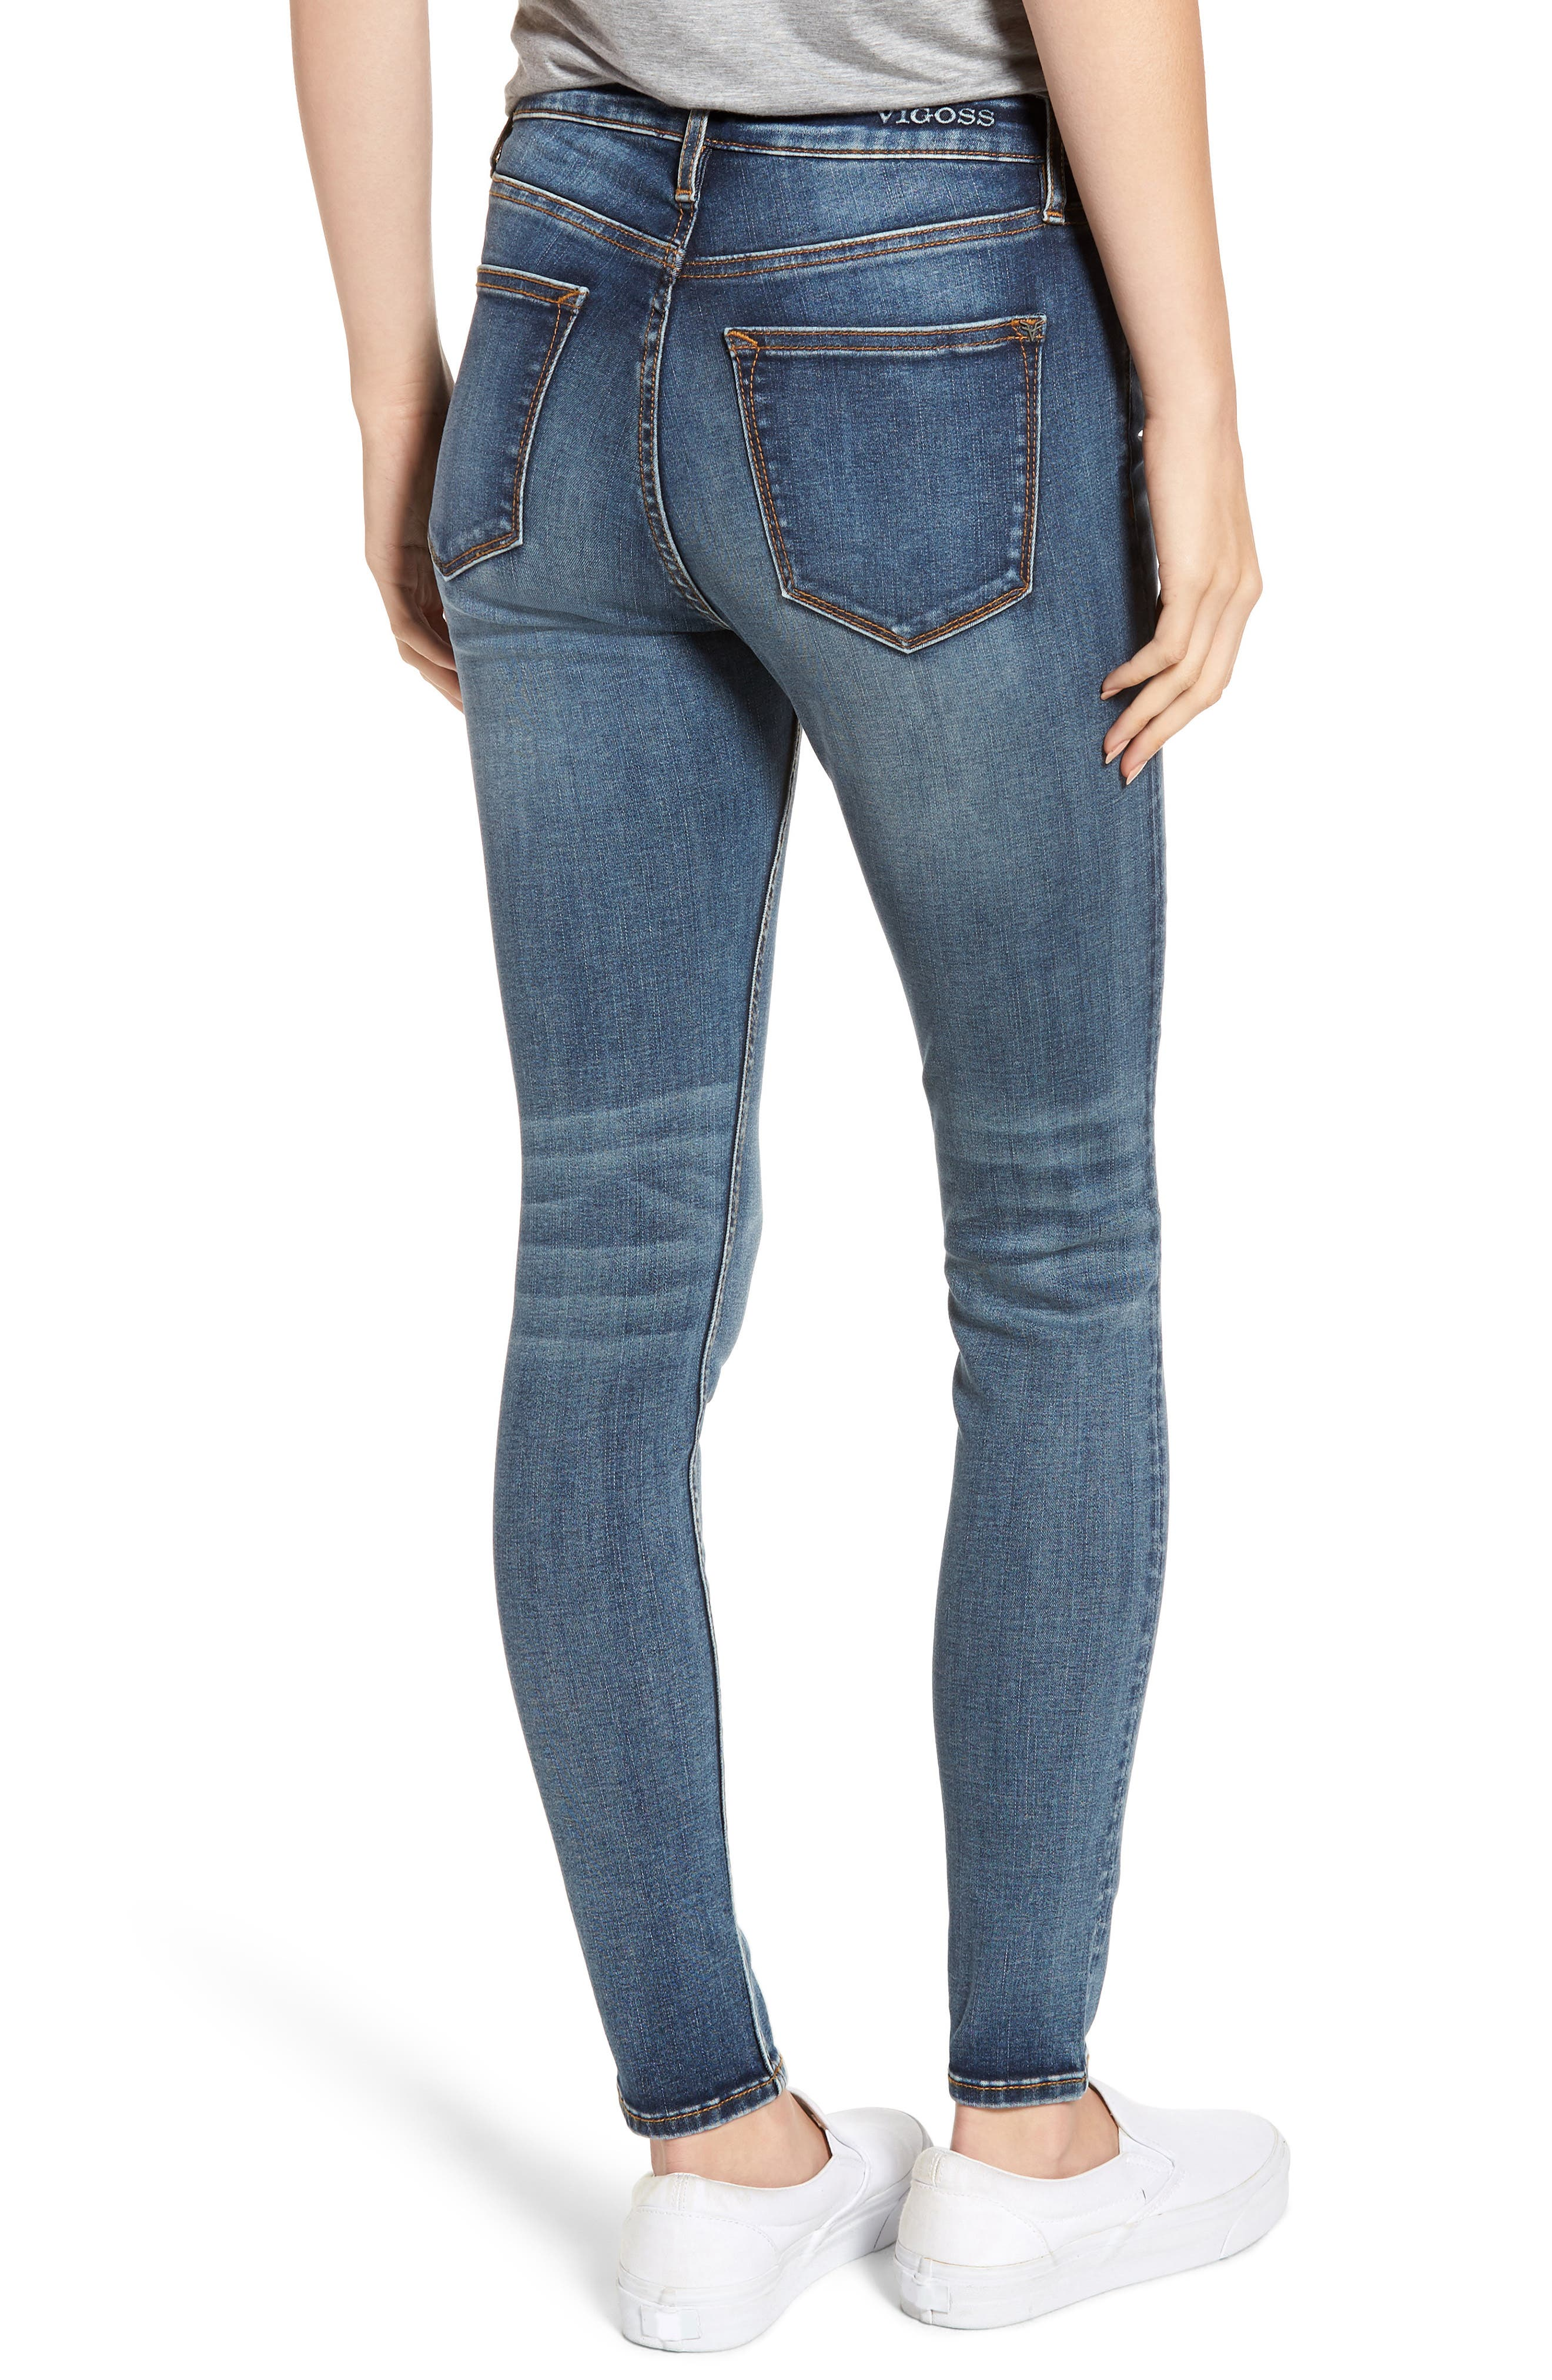 Marley Skinny Jeans,                             Alternate thumbnail 2, color,                             MED WASH